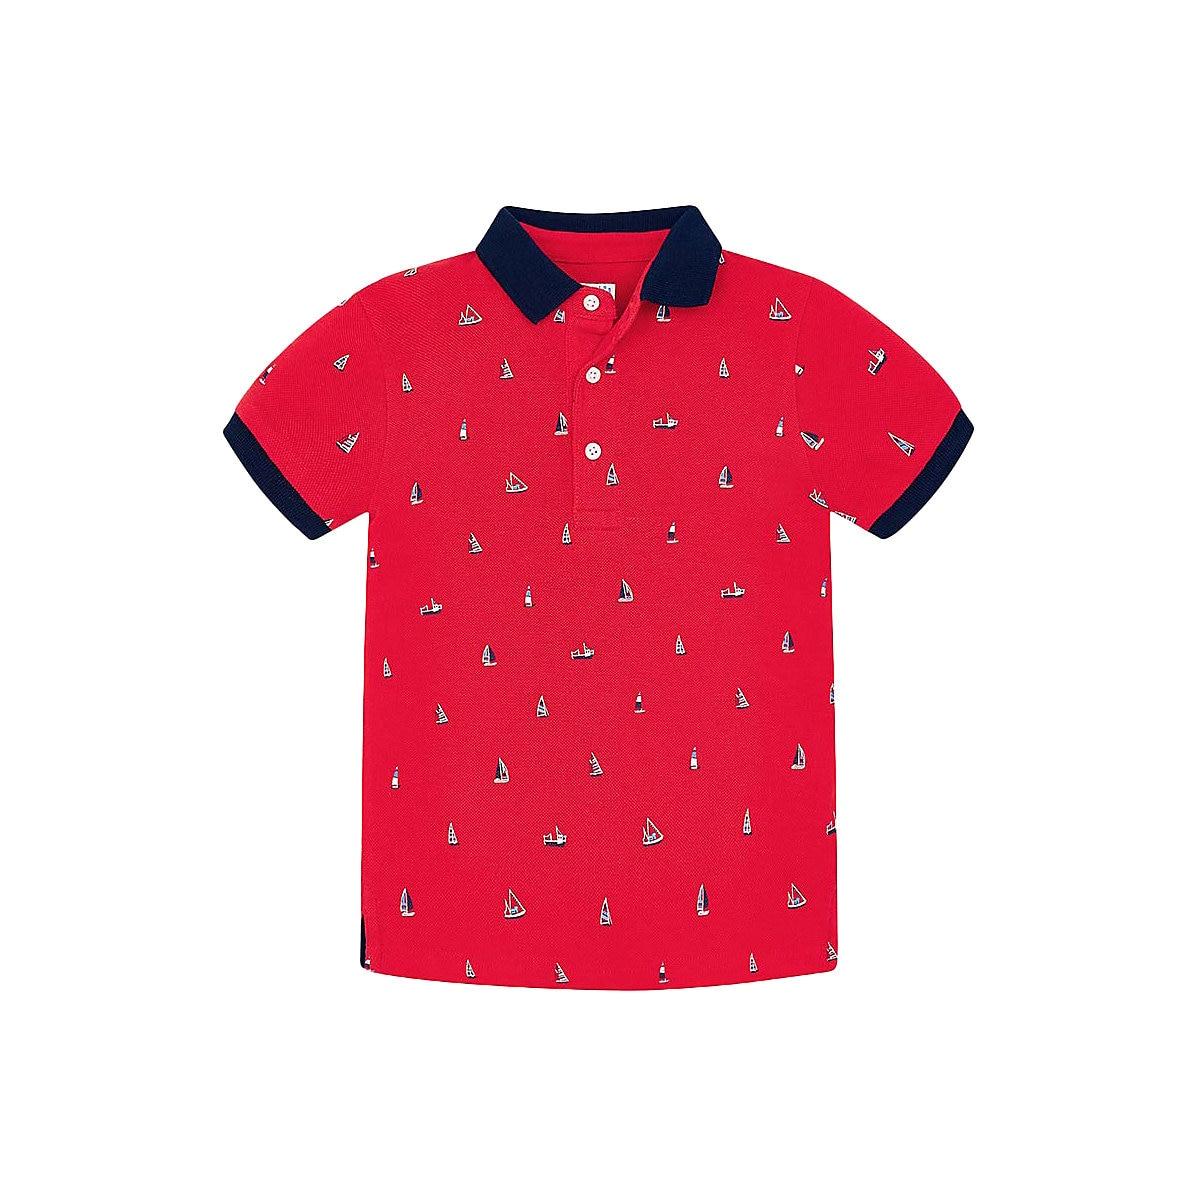 MAYORAL Polo Shirts 10685364 Children Clothing T-shirt Shirt The Print For Boys